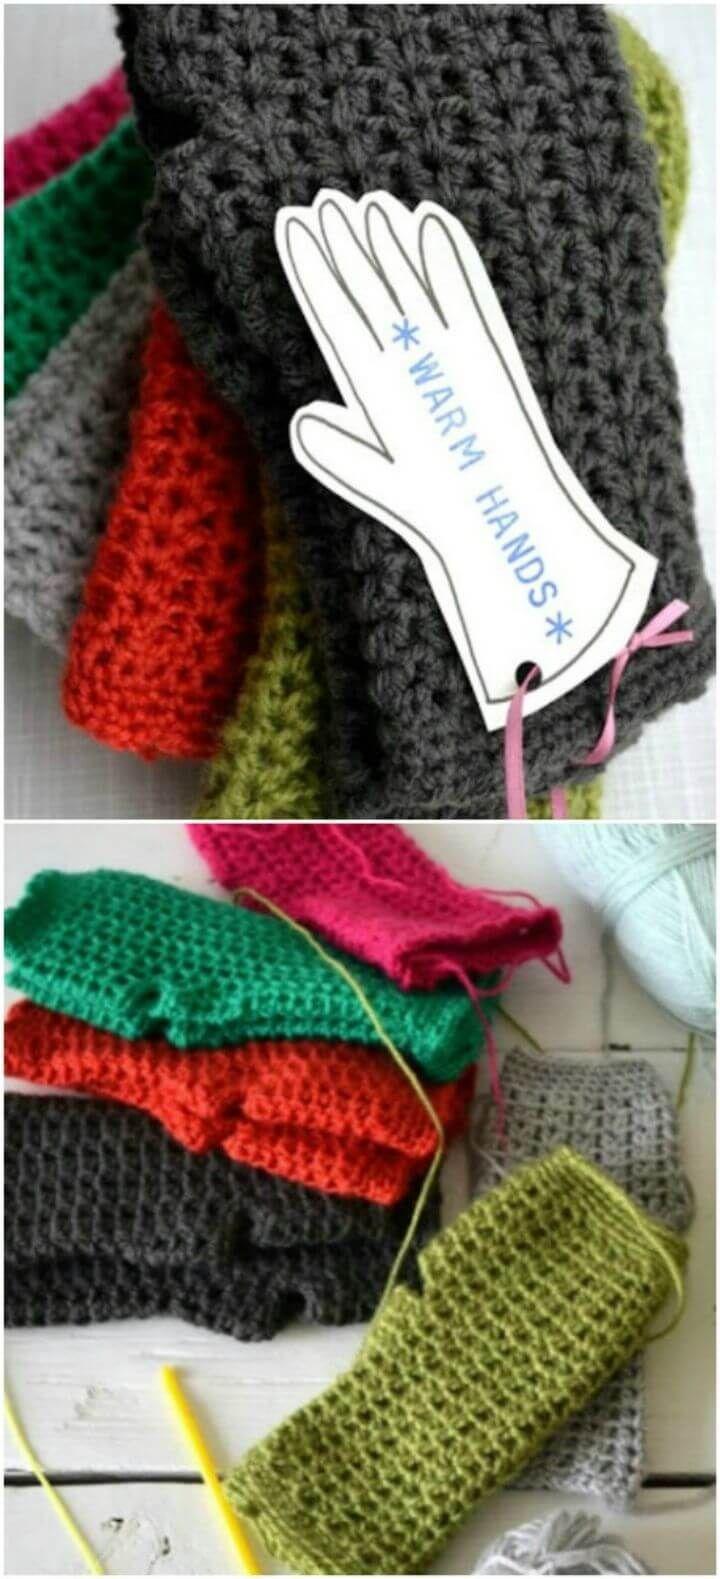 Best 25 crochet needles ideas on pinterest crochet hooks 101 free crochet patterns for beginners that are super easy bankloansurffo Choice Image